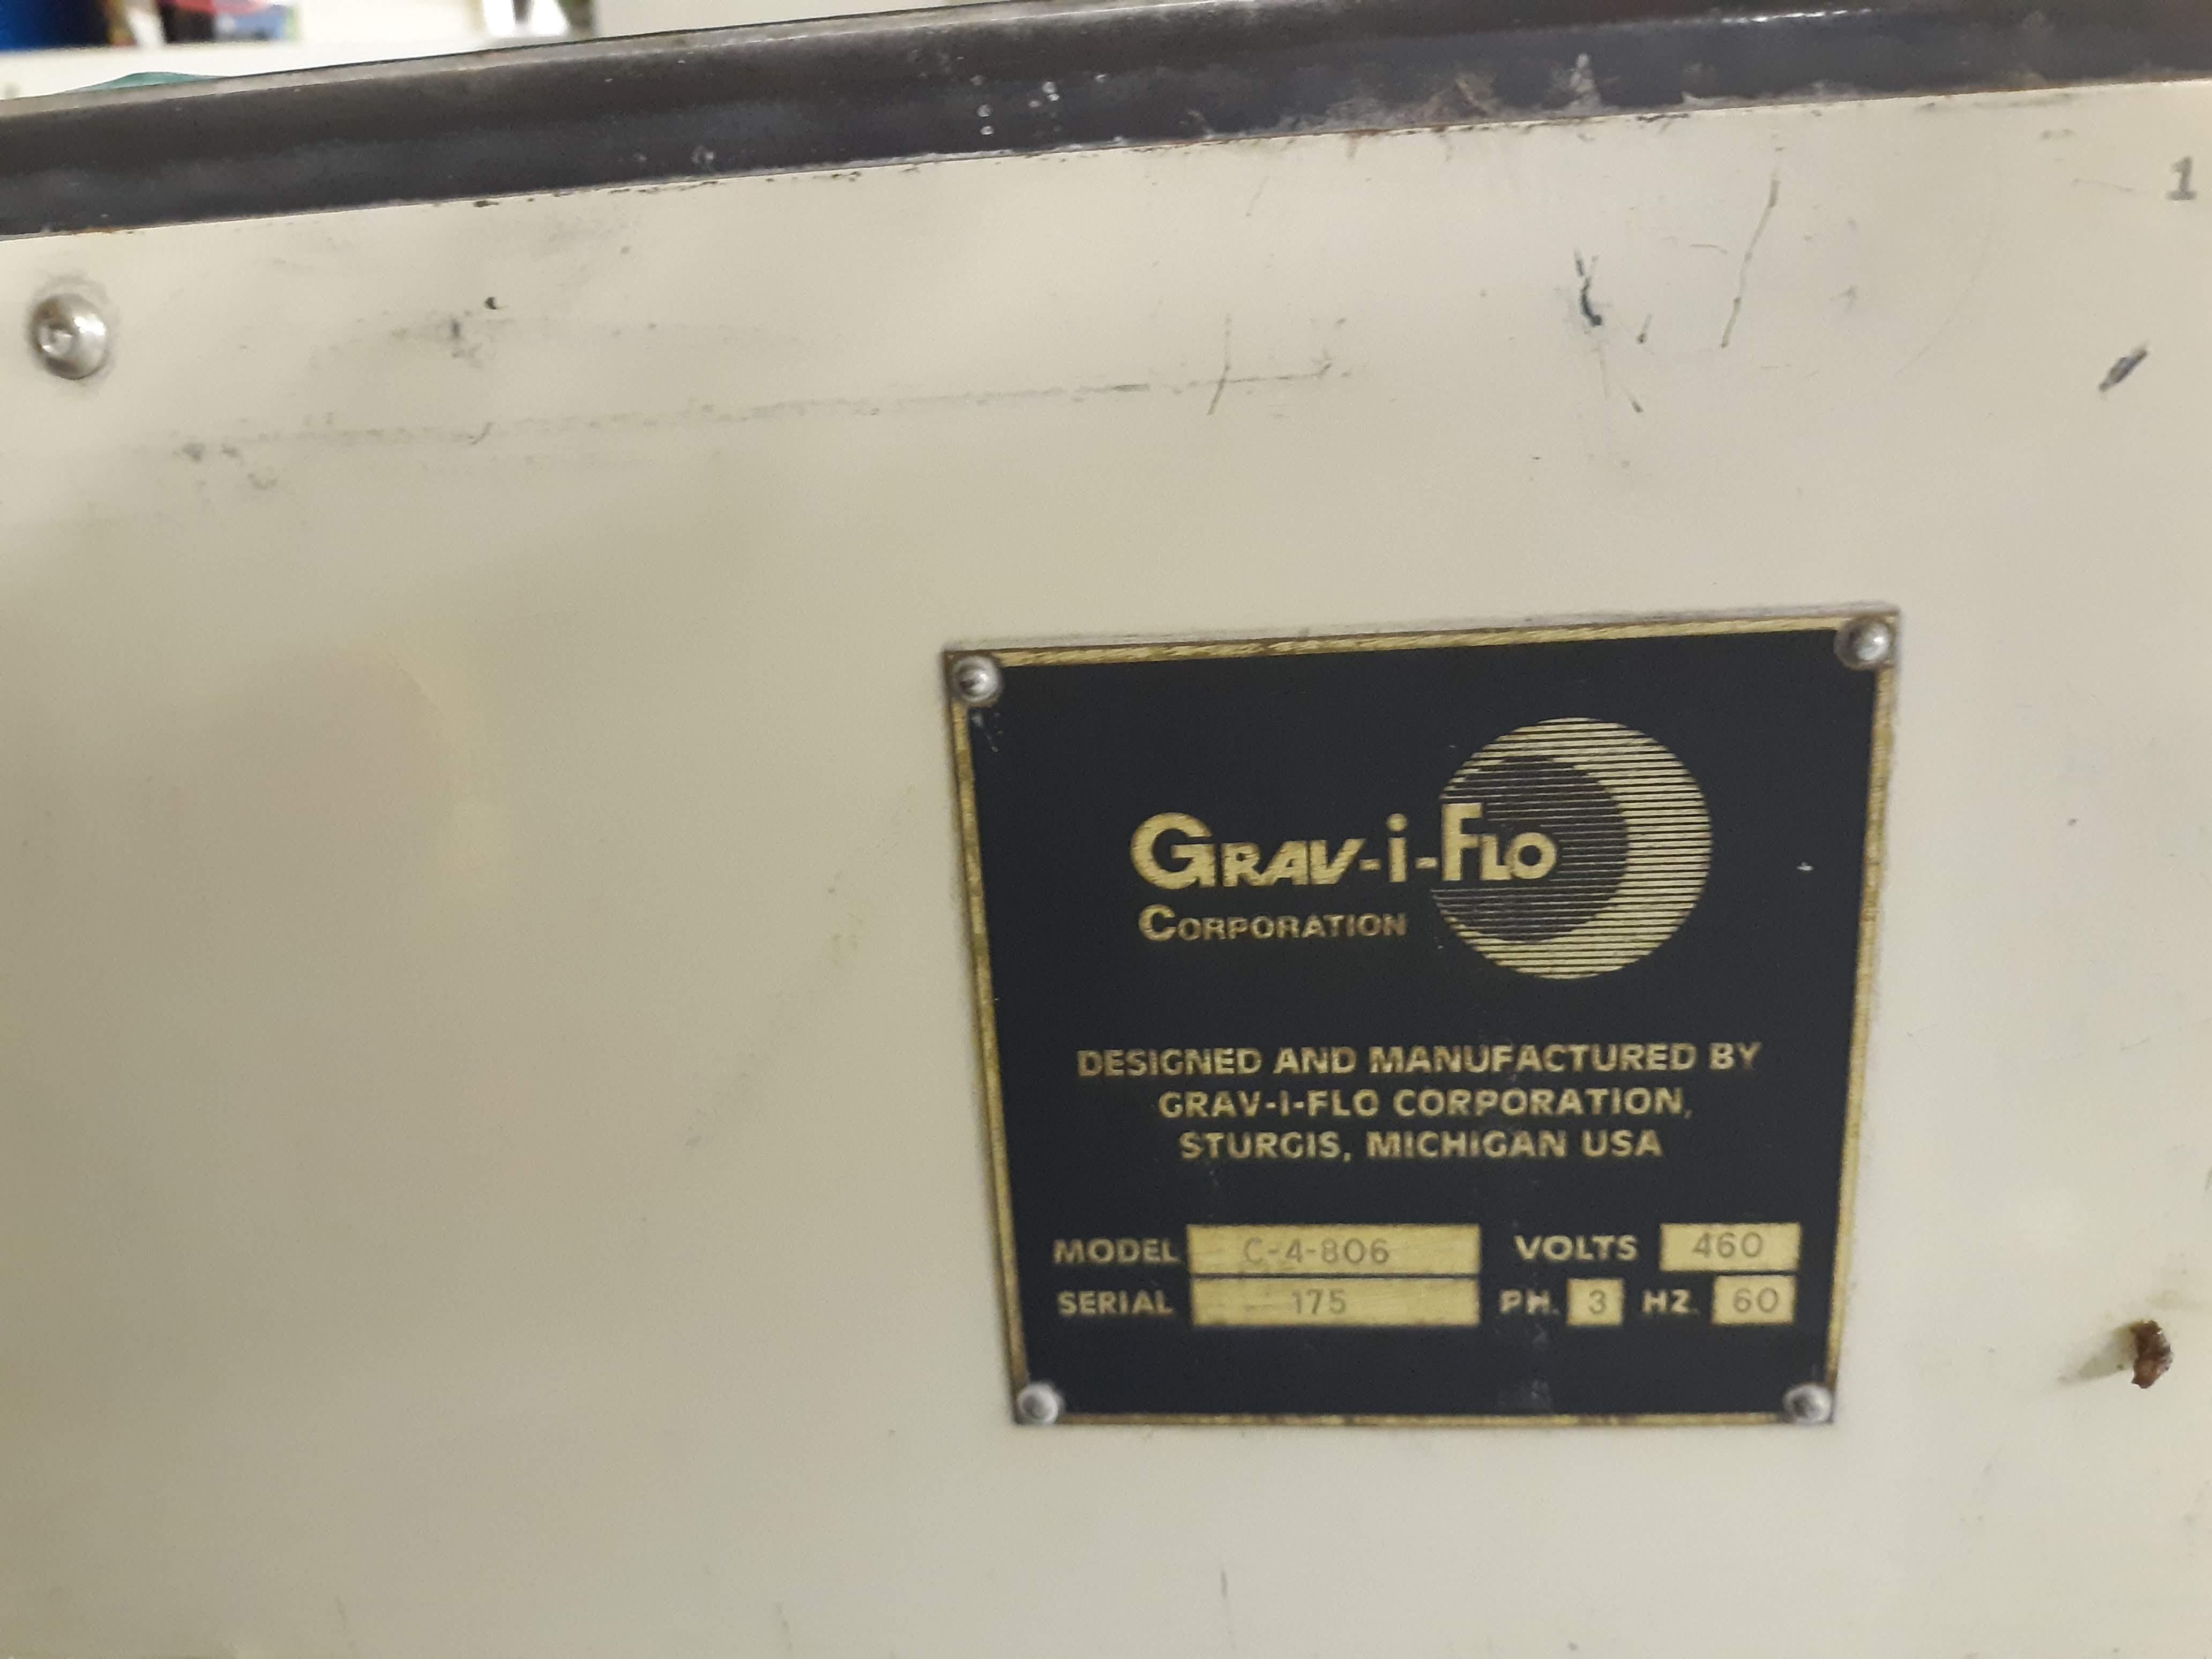 GRAV-I-FLO CENTRIFUGAL BARREL FINISHING MACHINE MODEL-C-4-806 S#175 460V/3PH/60HZ (LOCATED AT: 433 - Image 3 of 4